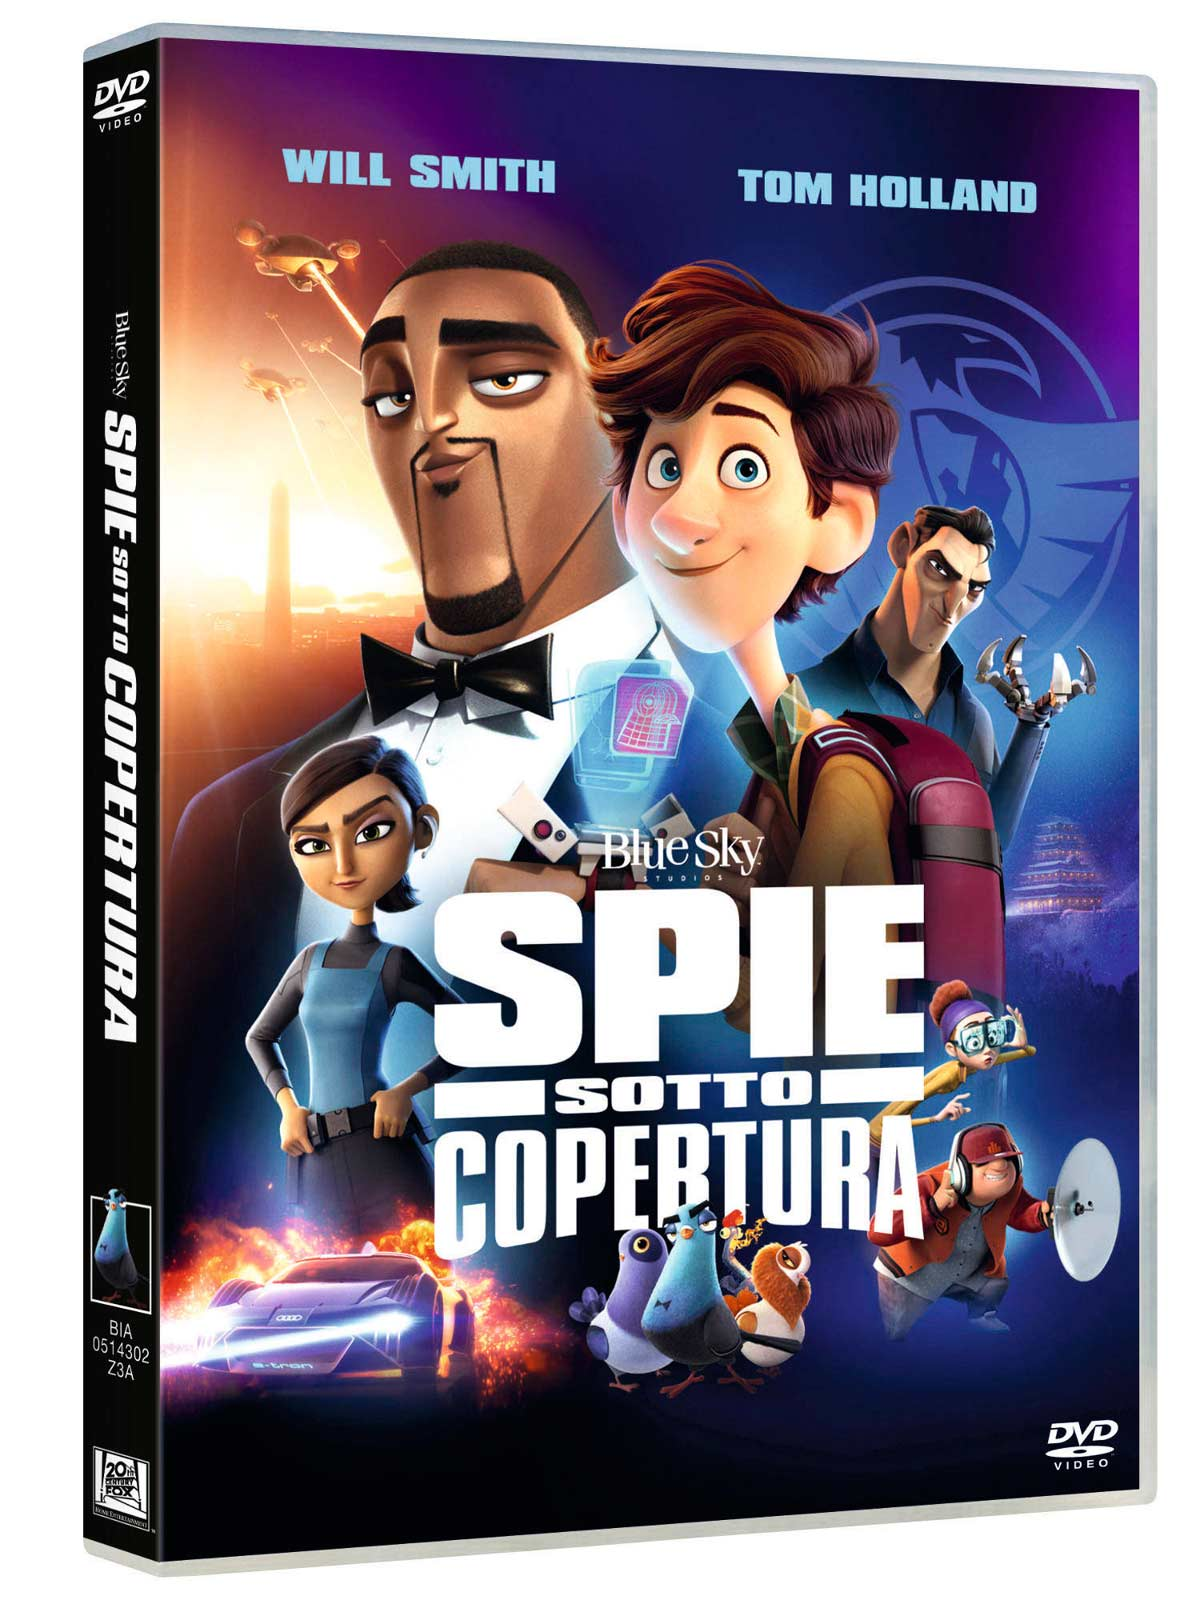 SPIE SOTTO COPERTURA (DVD)